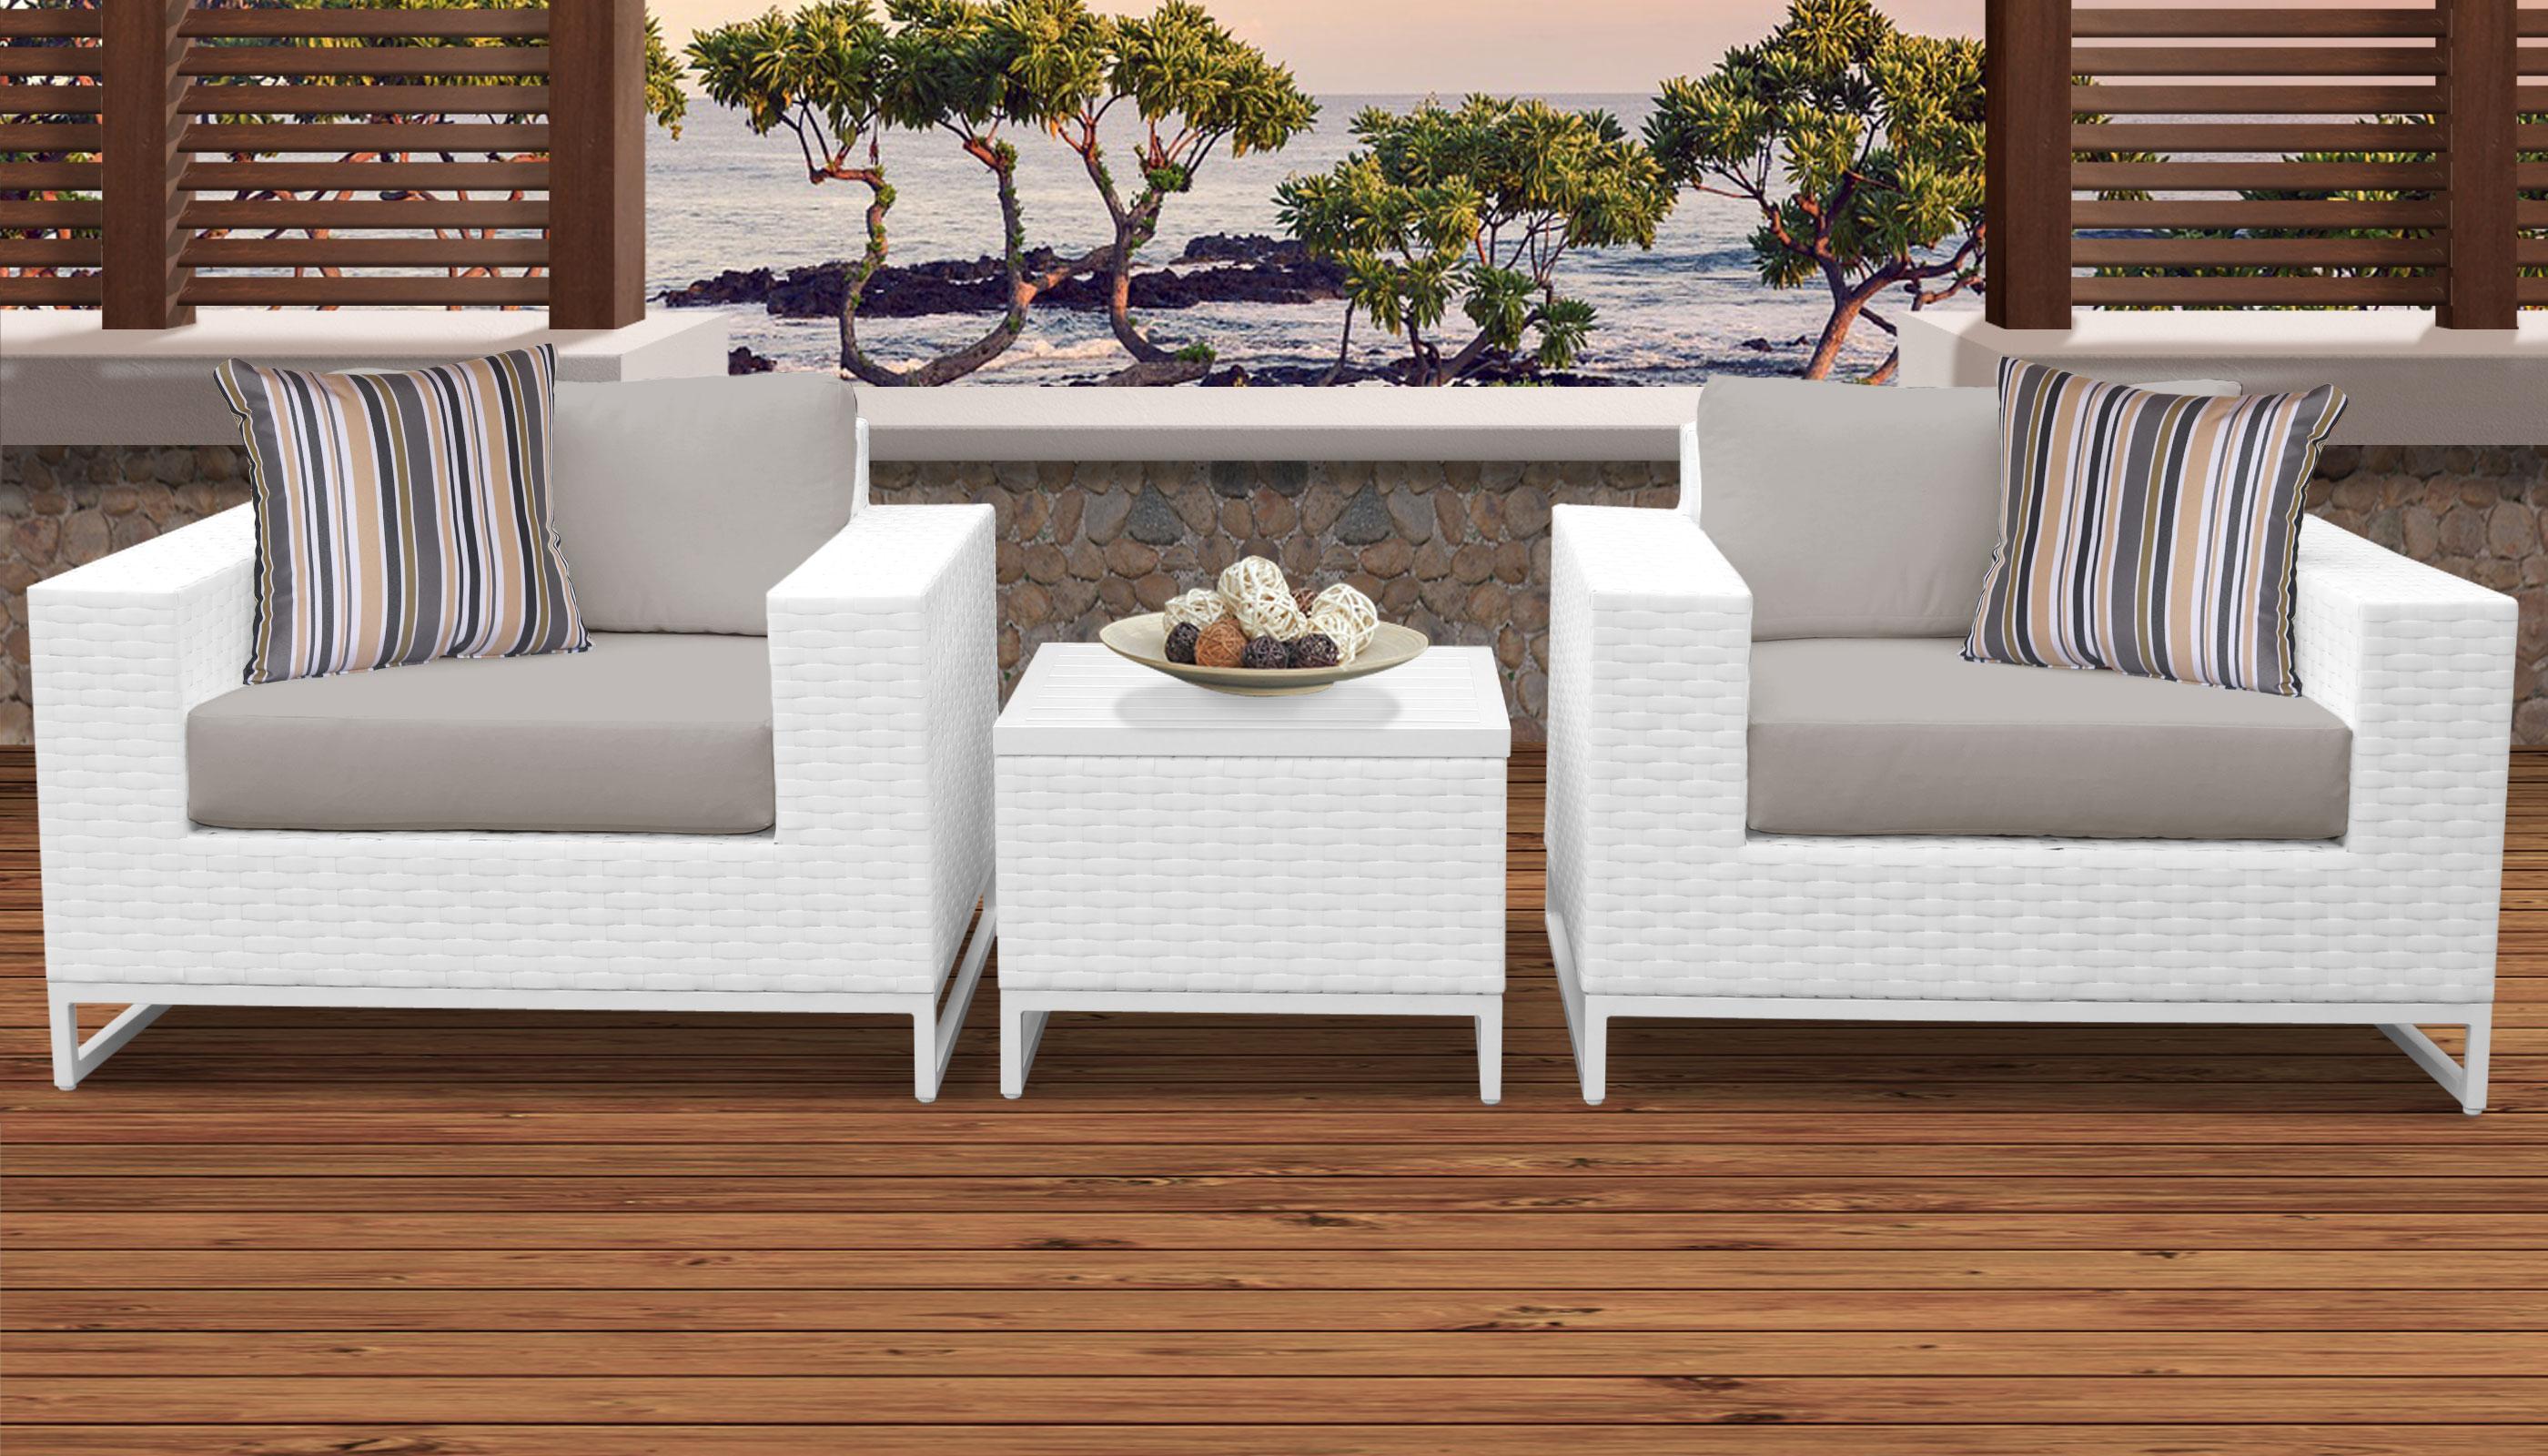 Miami 3 Piece Outdoor Wicker Patio Furniture Set 03b